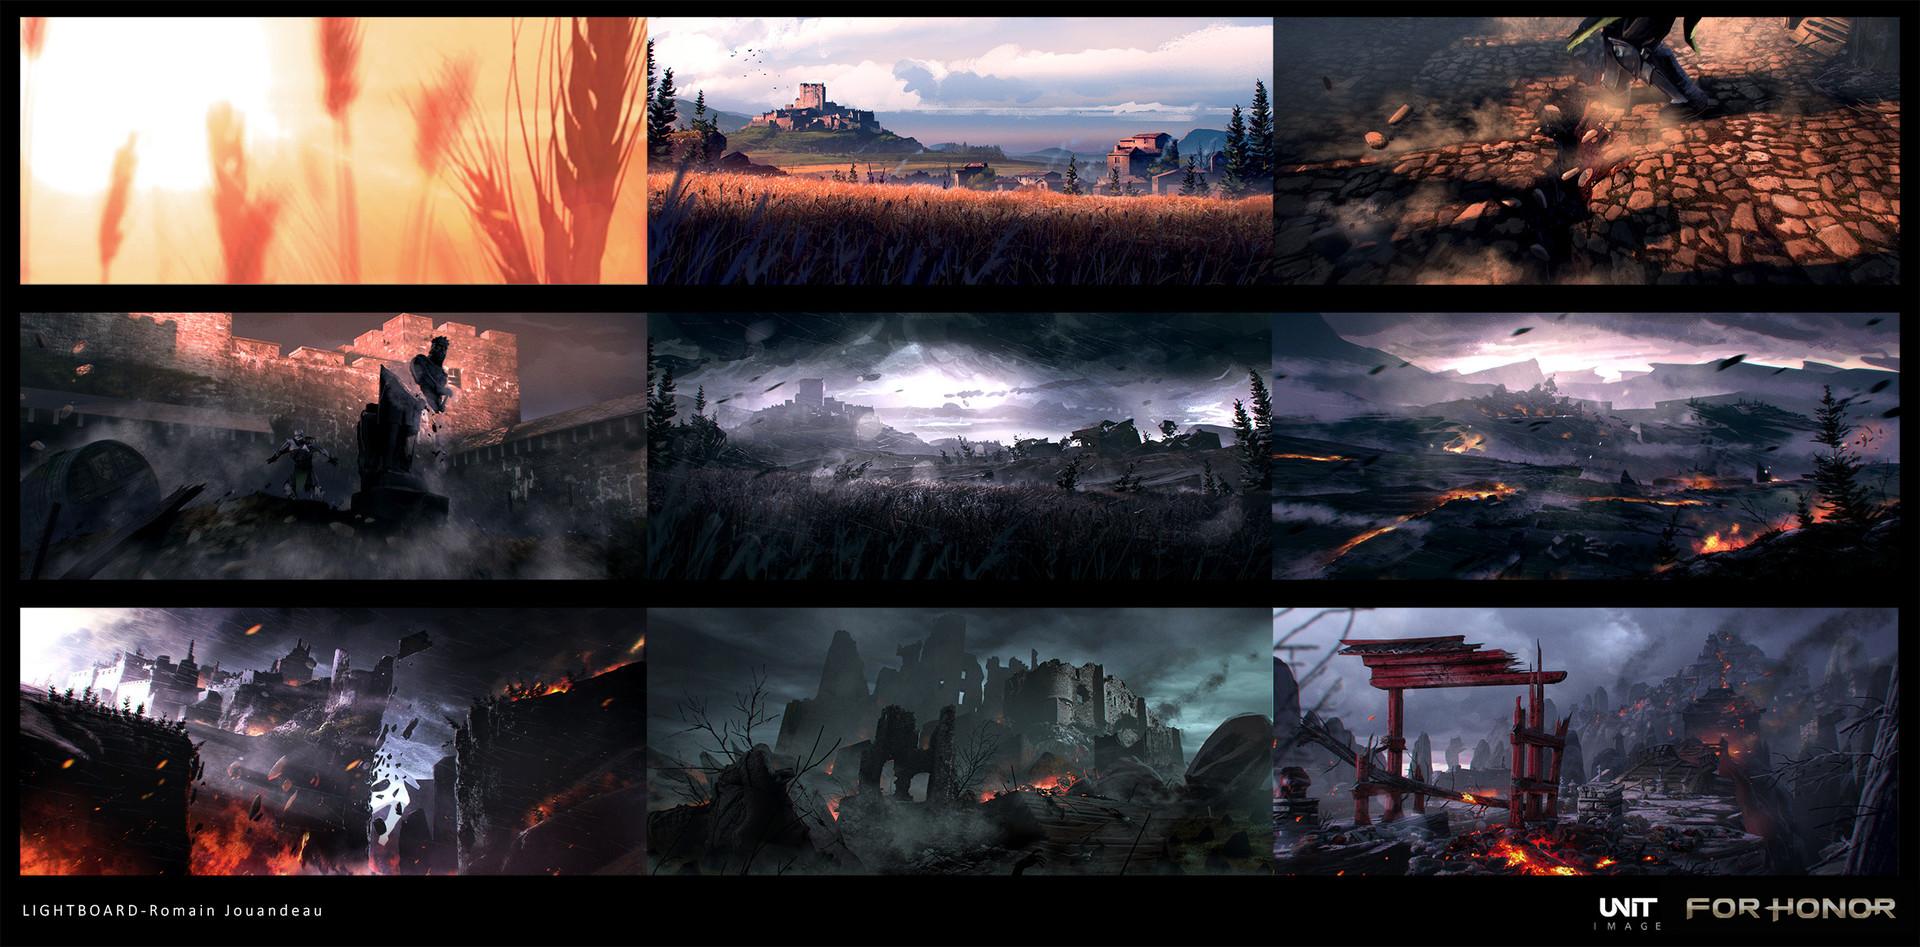 Romain Jouandeau - For Honor Cinematic Trailer